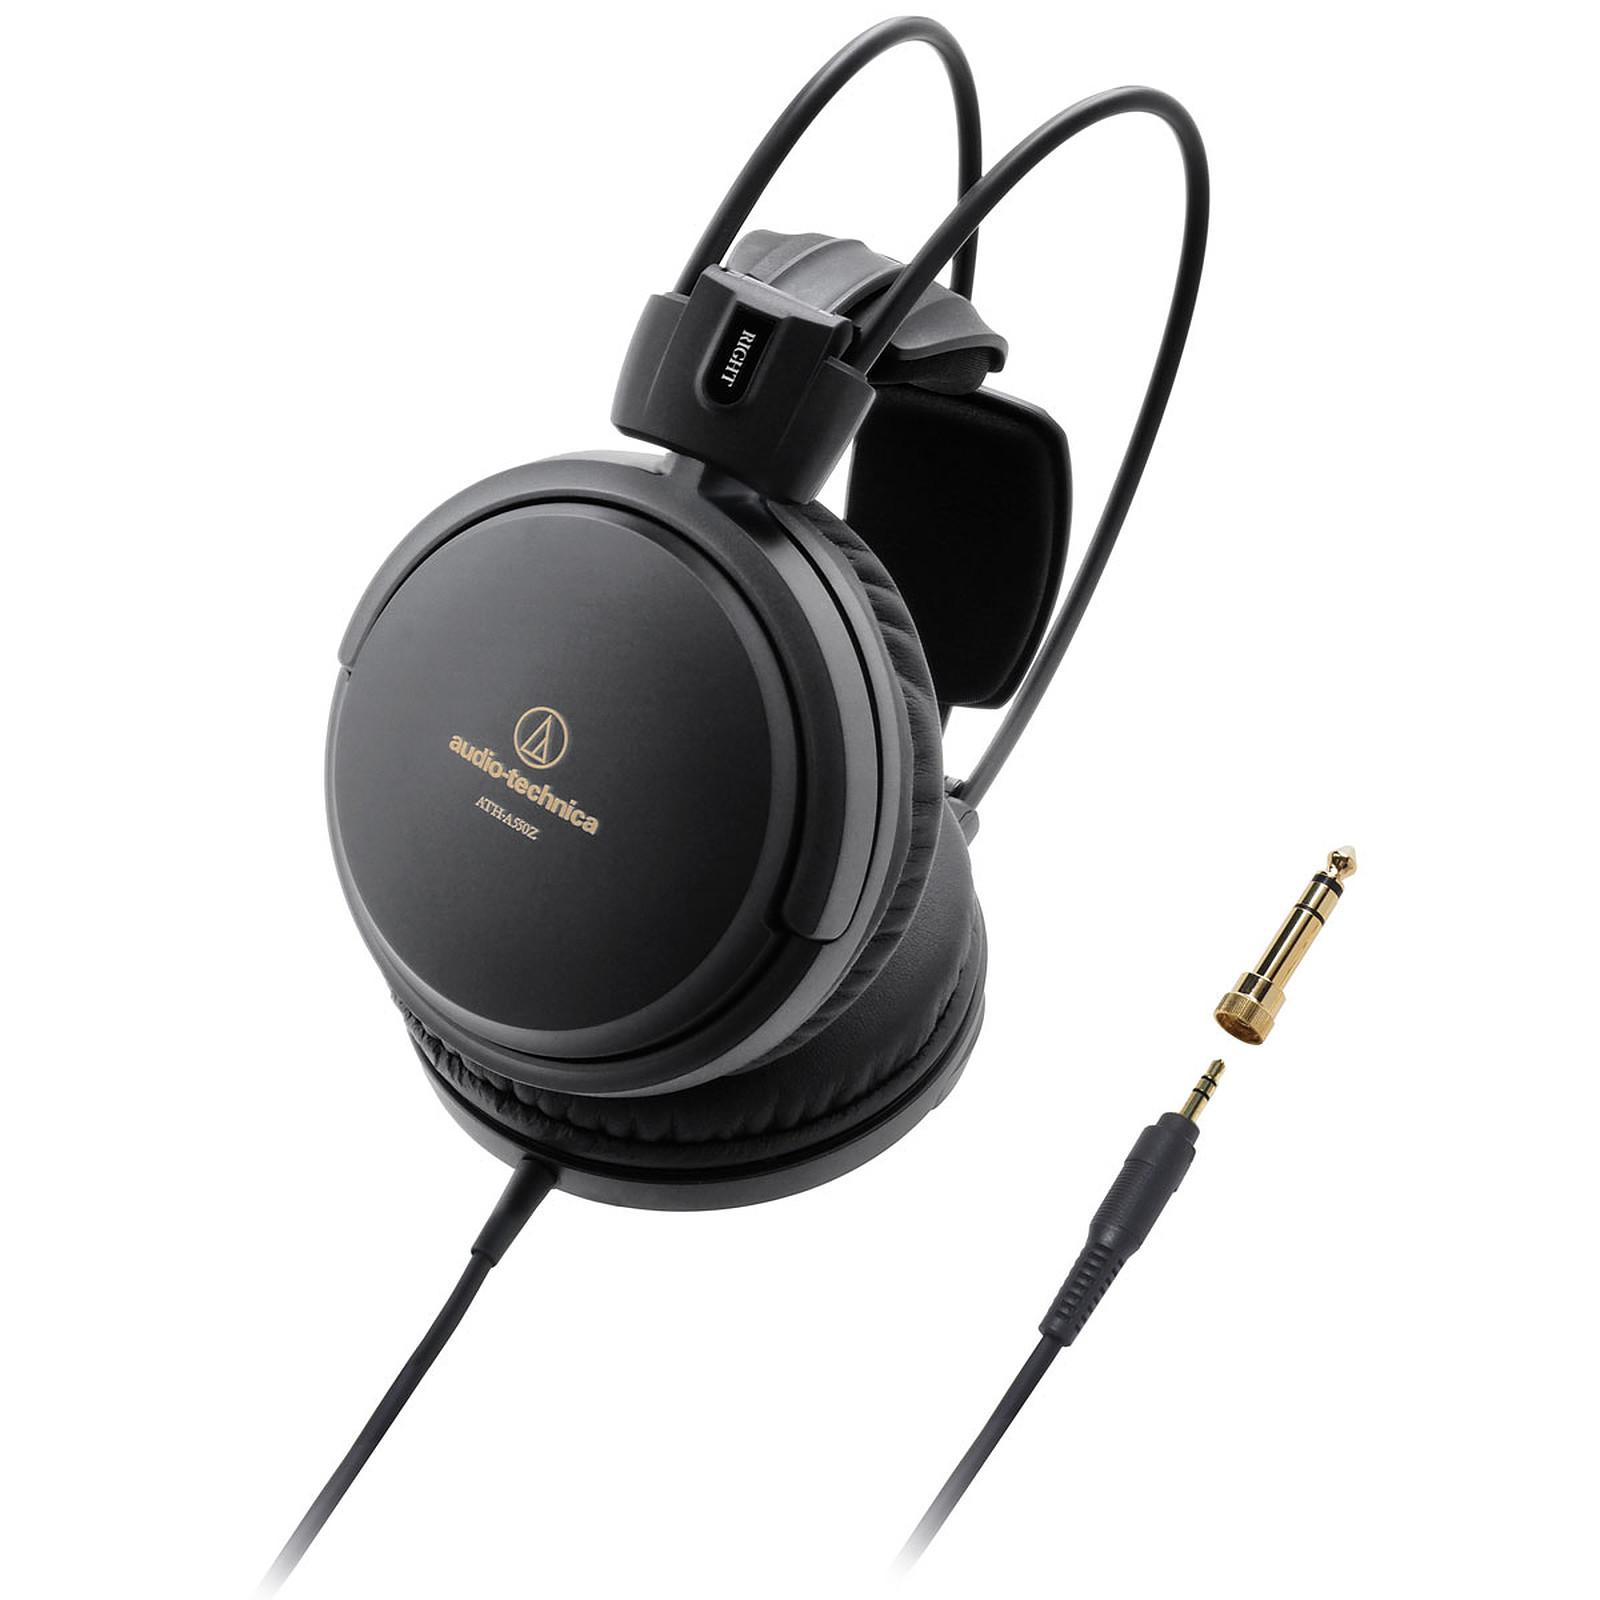 Audio-Technica ATH-A550Z Noir